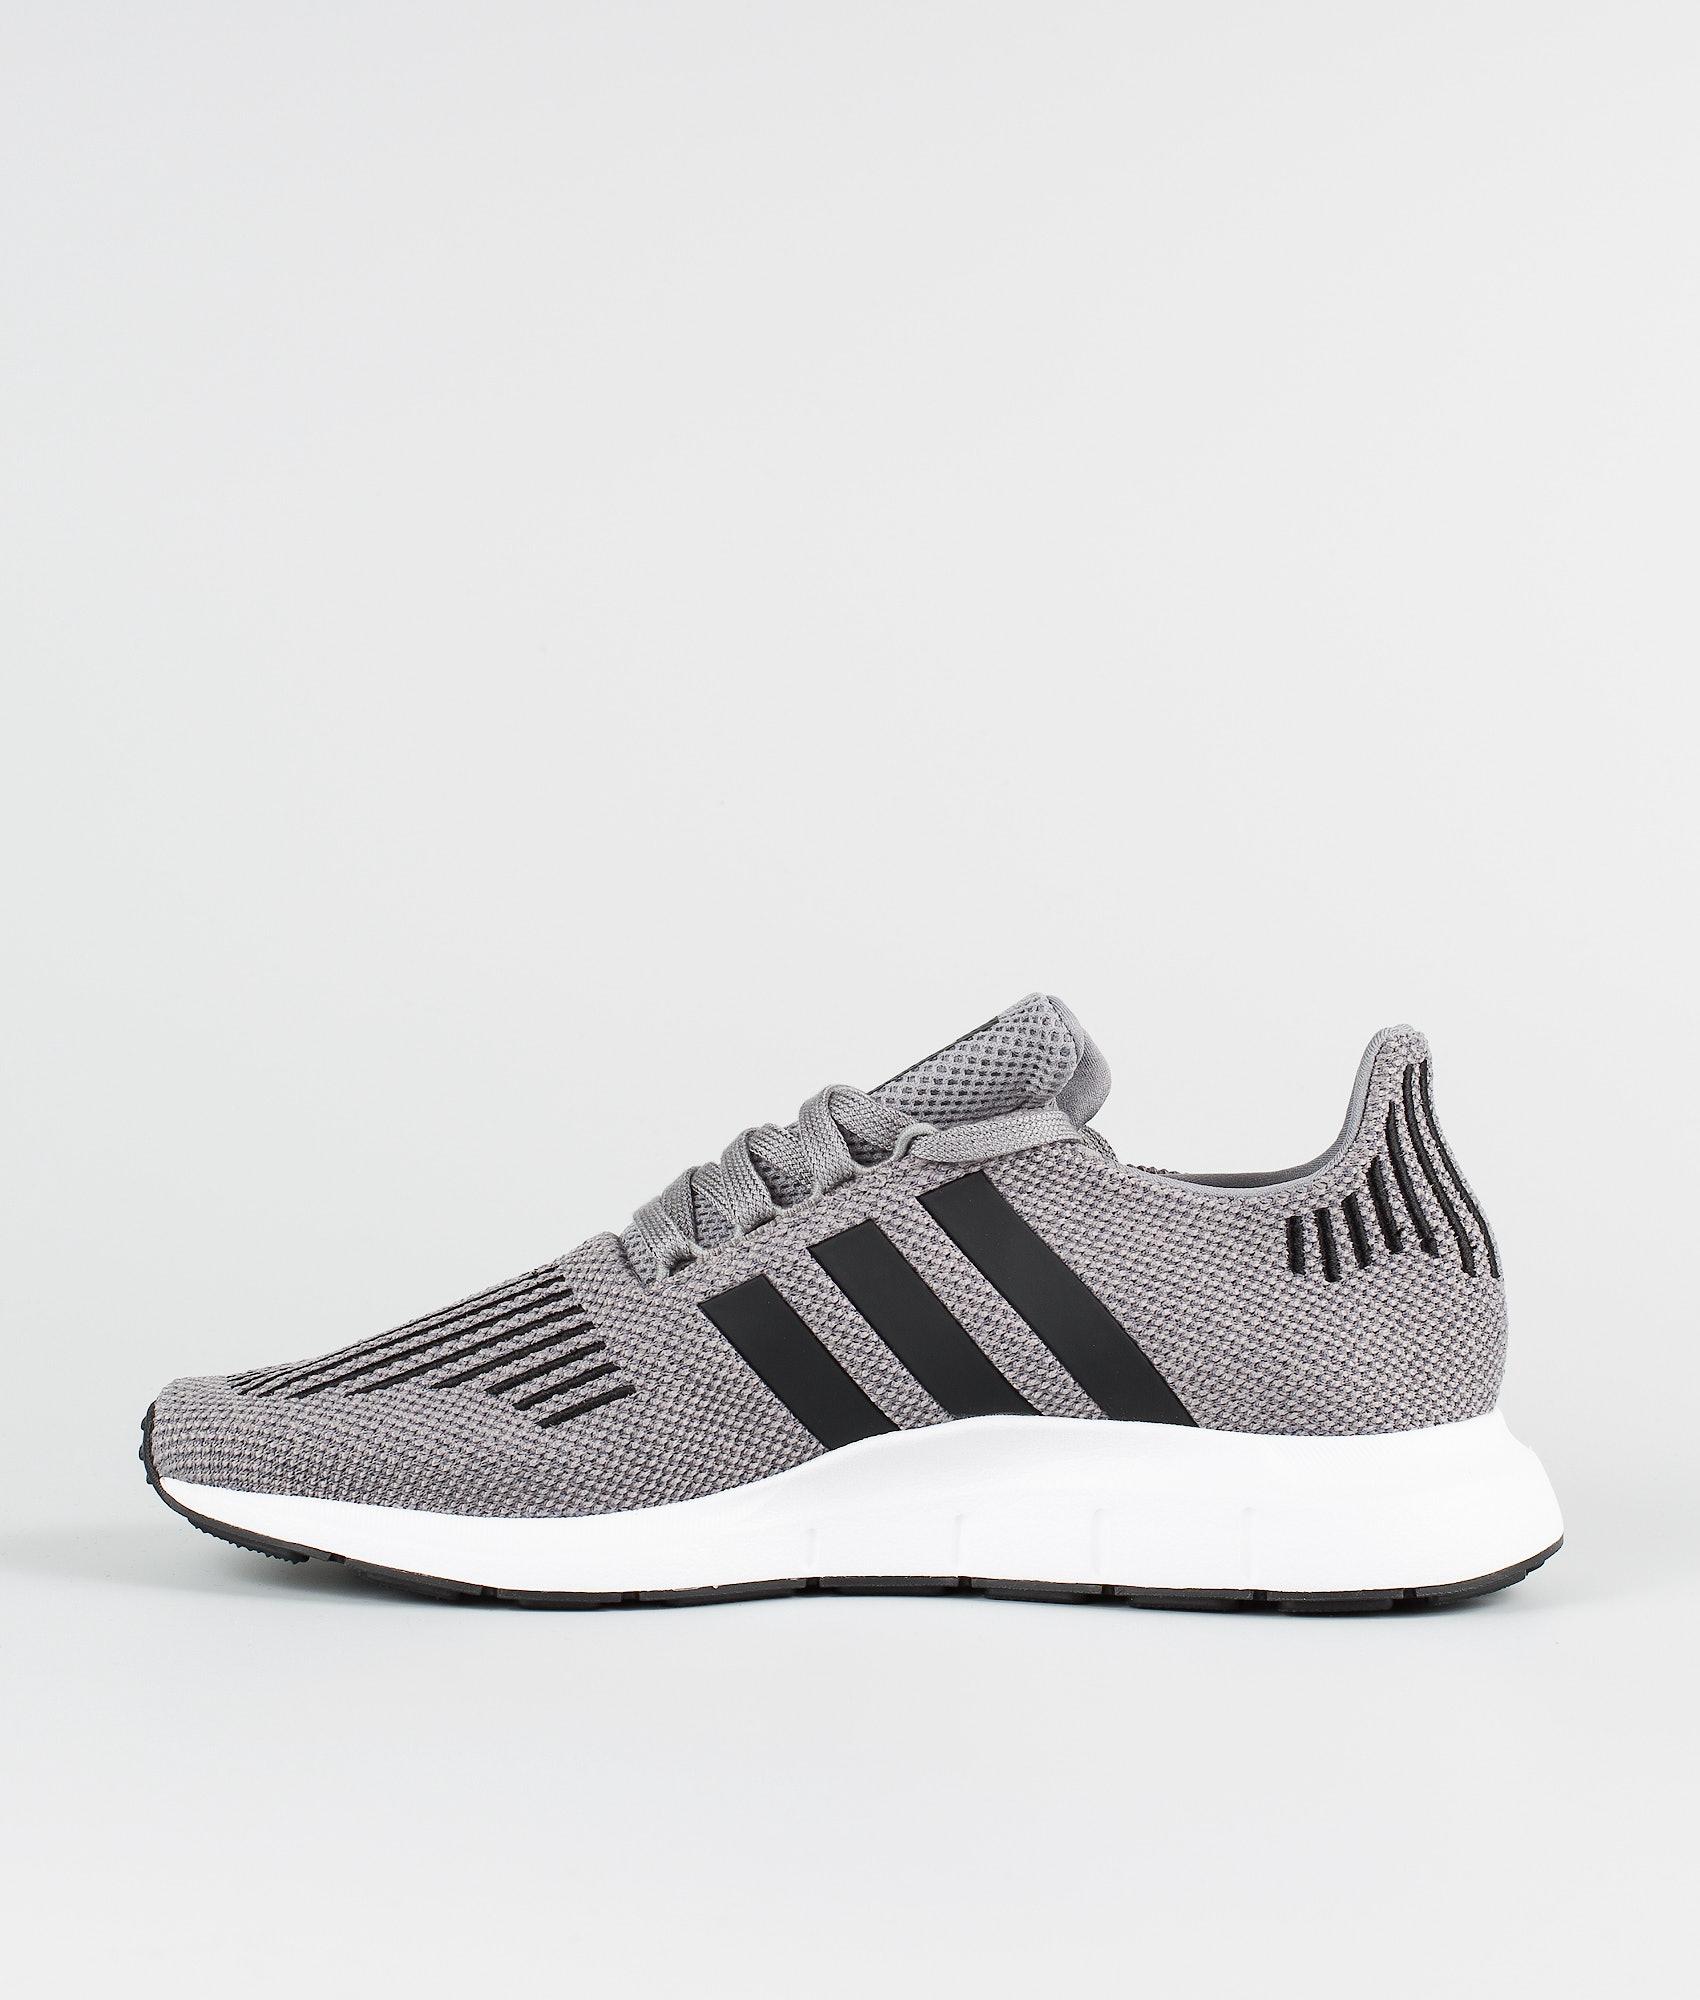 regard détaillé 05d8f a6c13 Adidas Originals Swift Run Shoes Grey Heather/Core Black/Medium Grey Heather